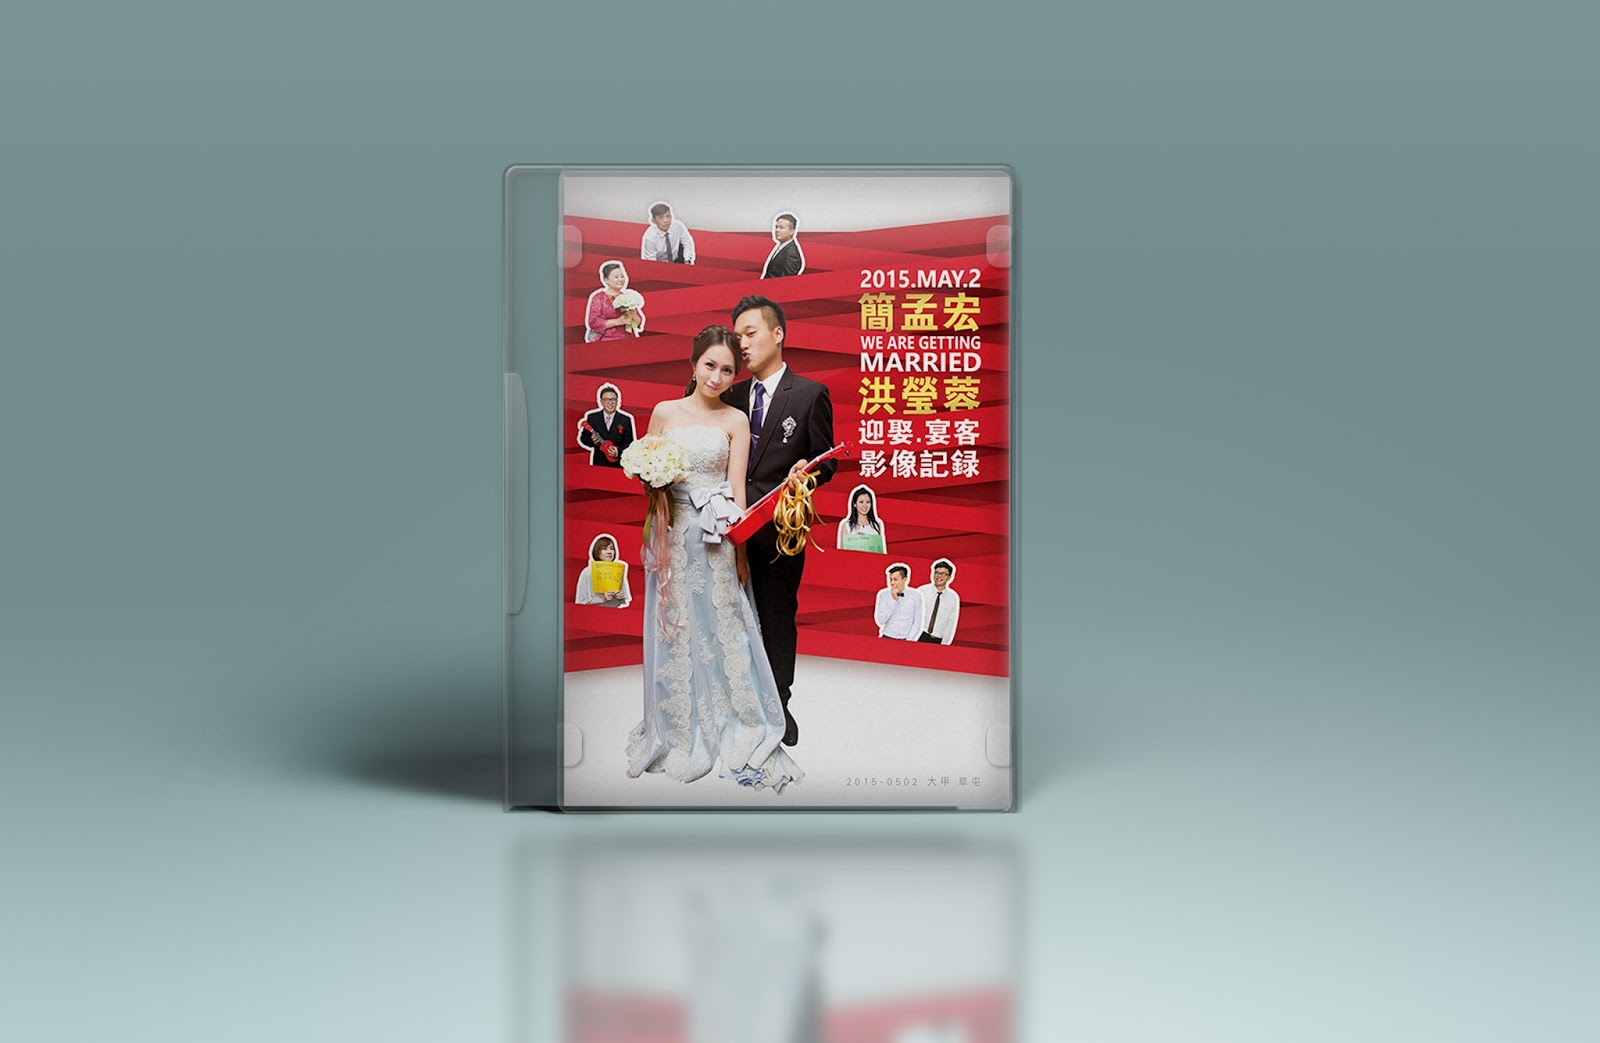 SHOWCASE作品展示 | 孟宏×盈蓉婚攝DVD封面設計 by MUMULab.com